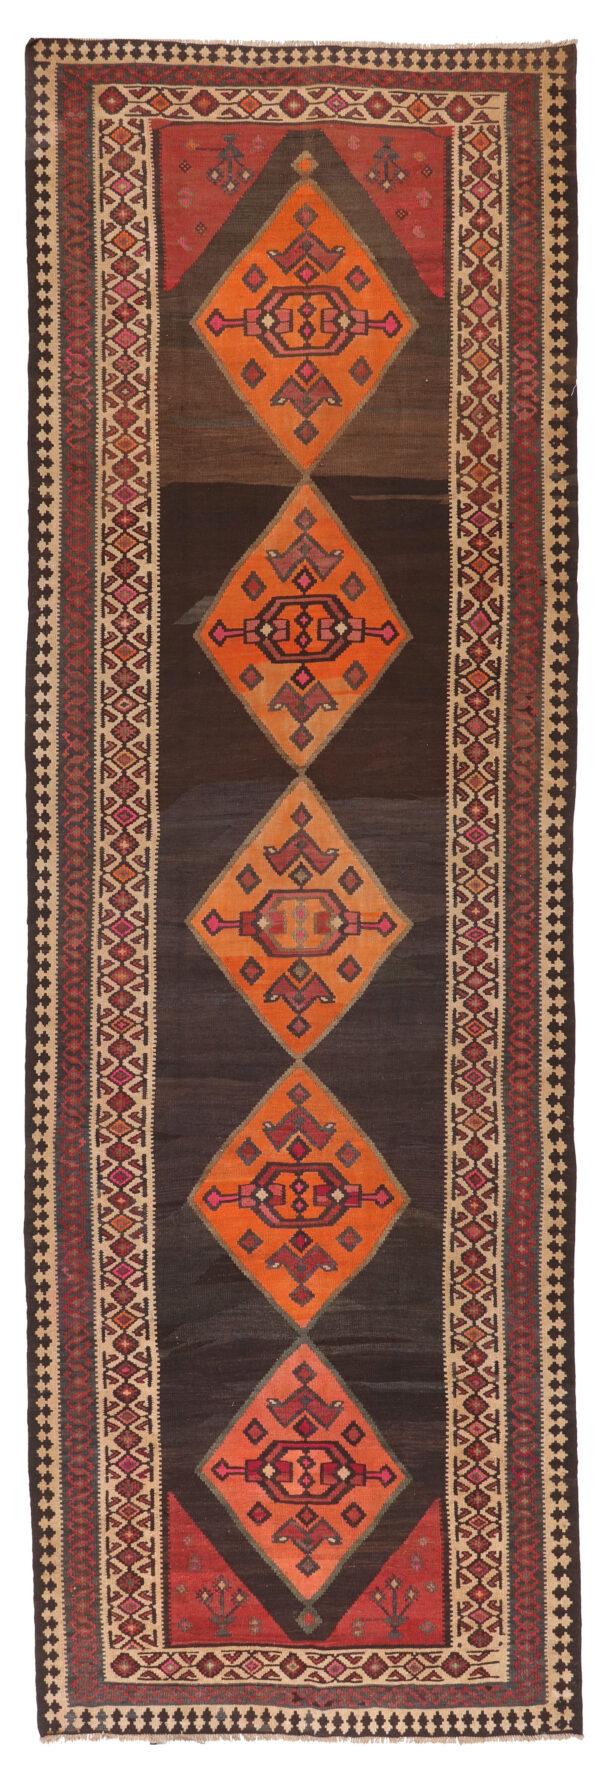 337452 Azerbaijan Kilim Size 475 X 153 Cm 1 600x1772